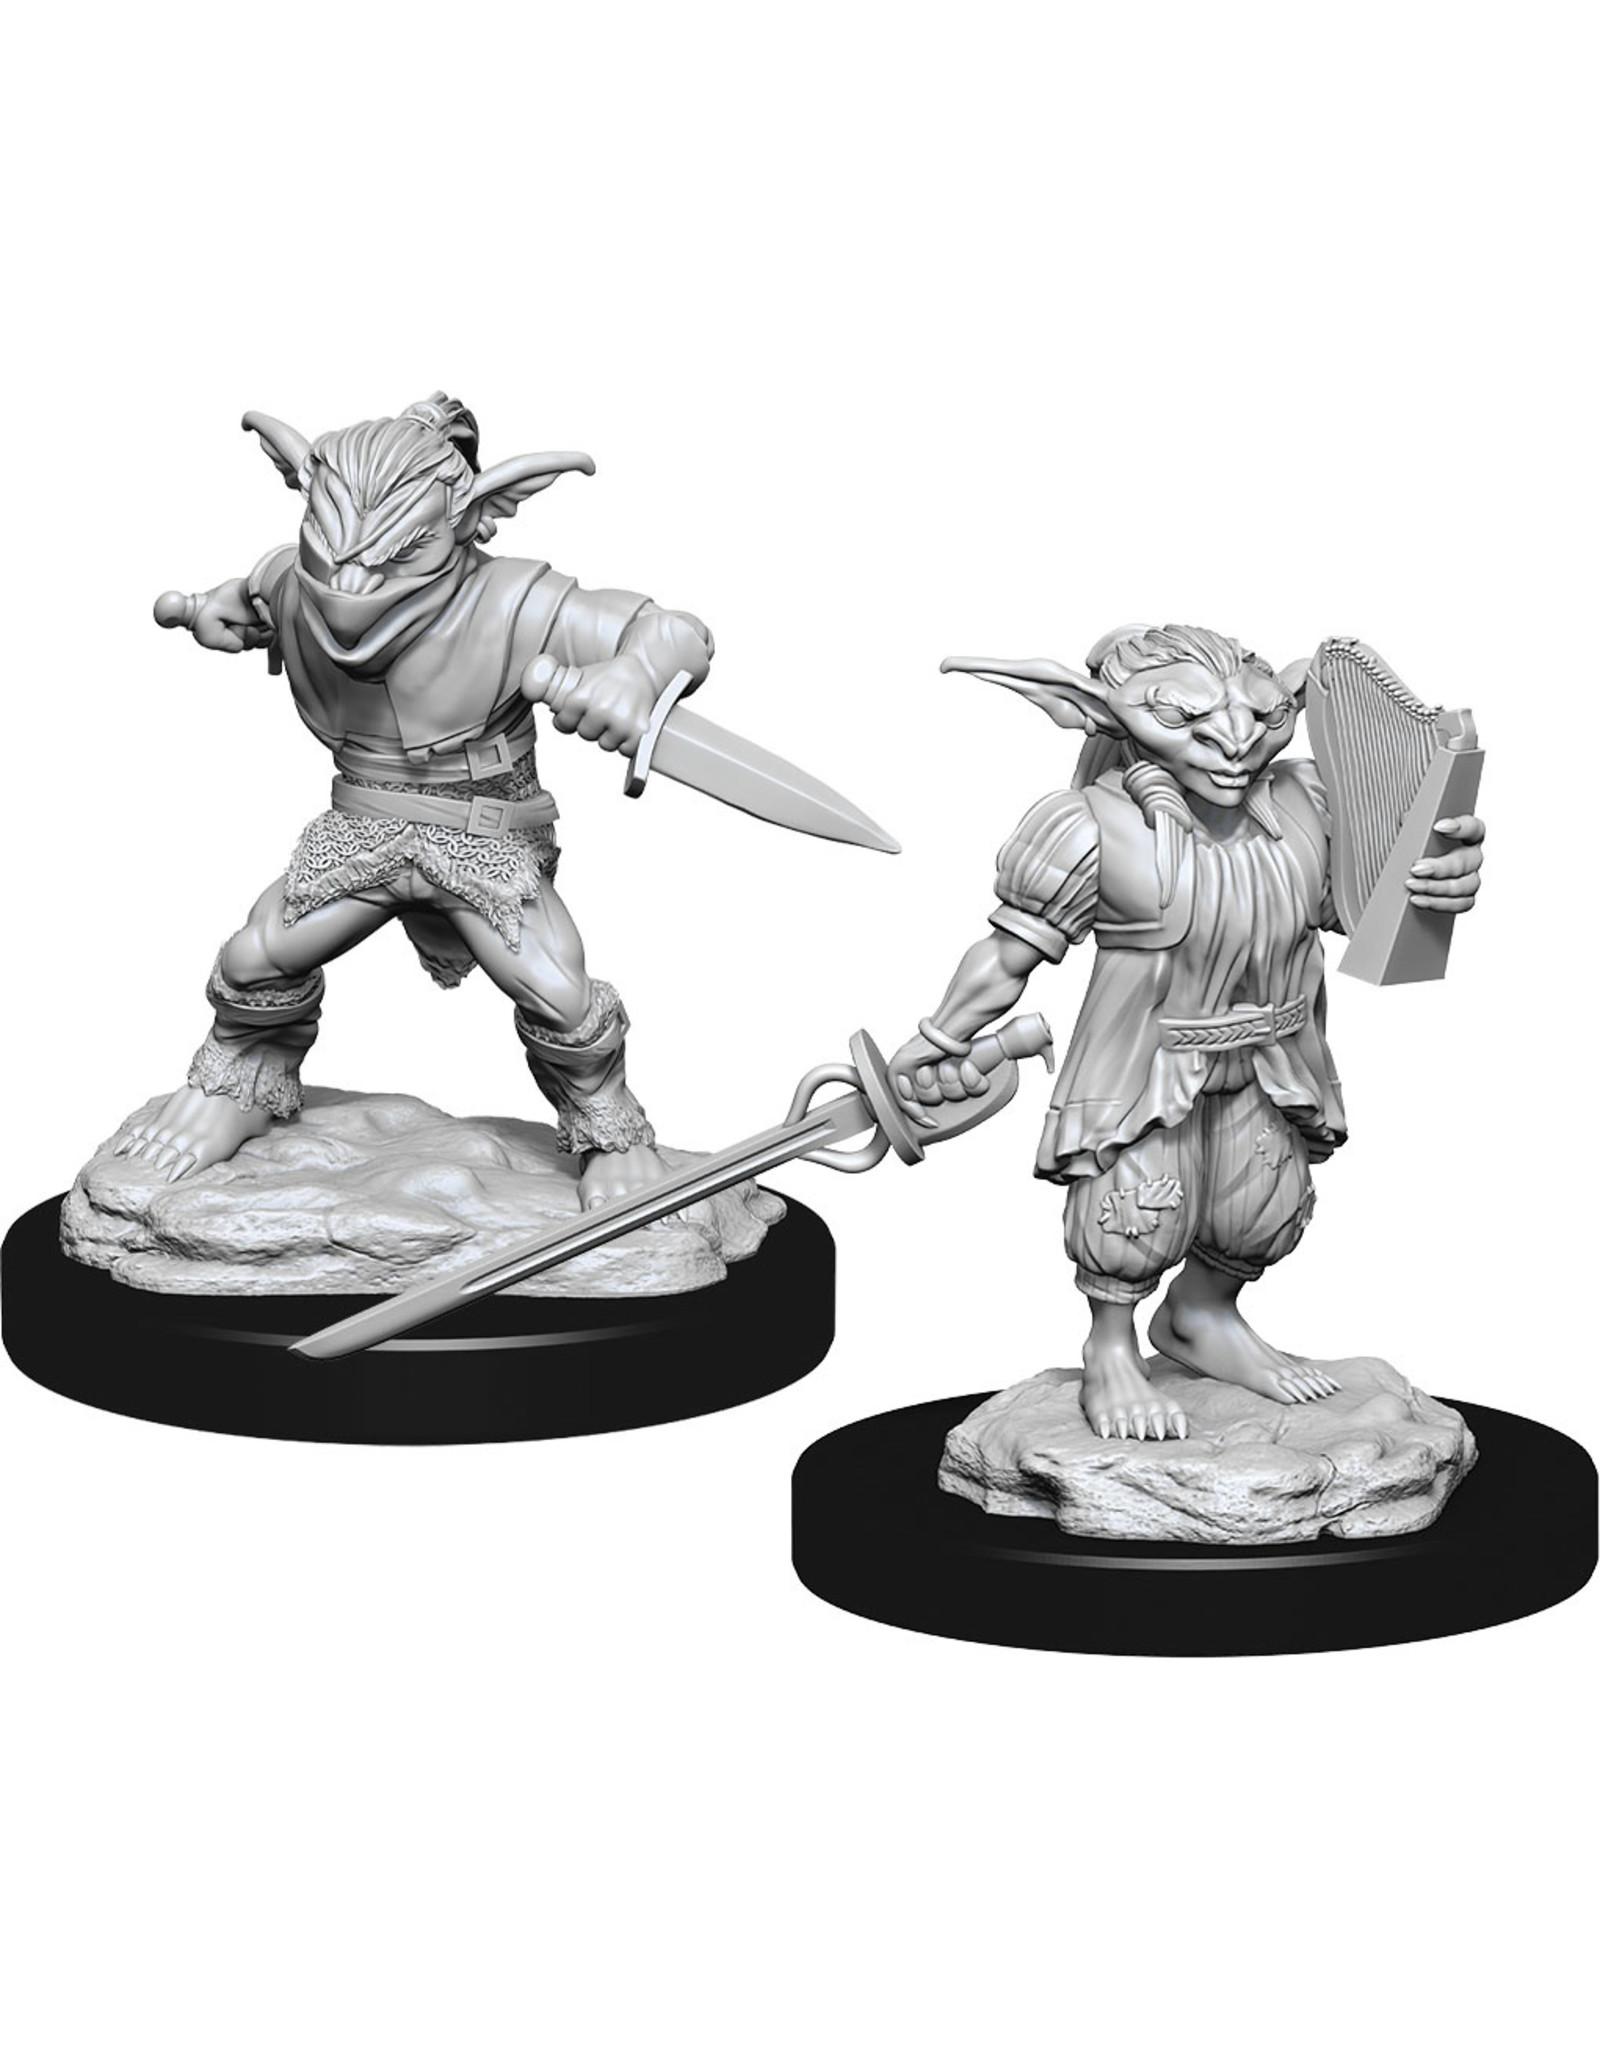 Wiz Kids D&D NMU: W15 Male Goblin Rogue & Female Goblin Bard